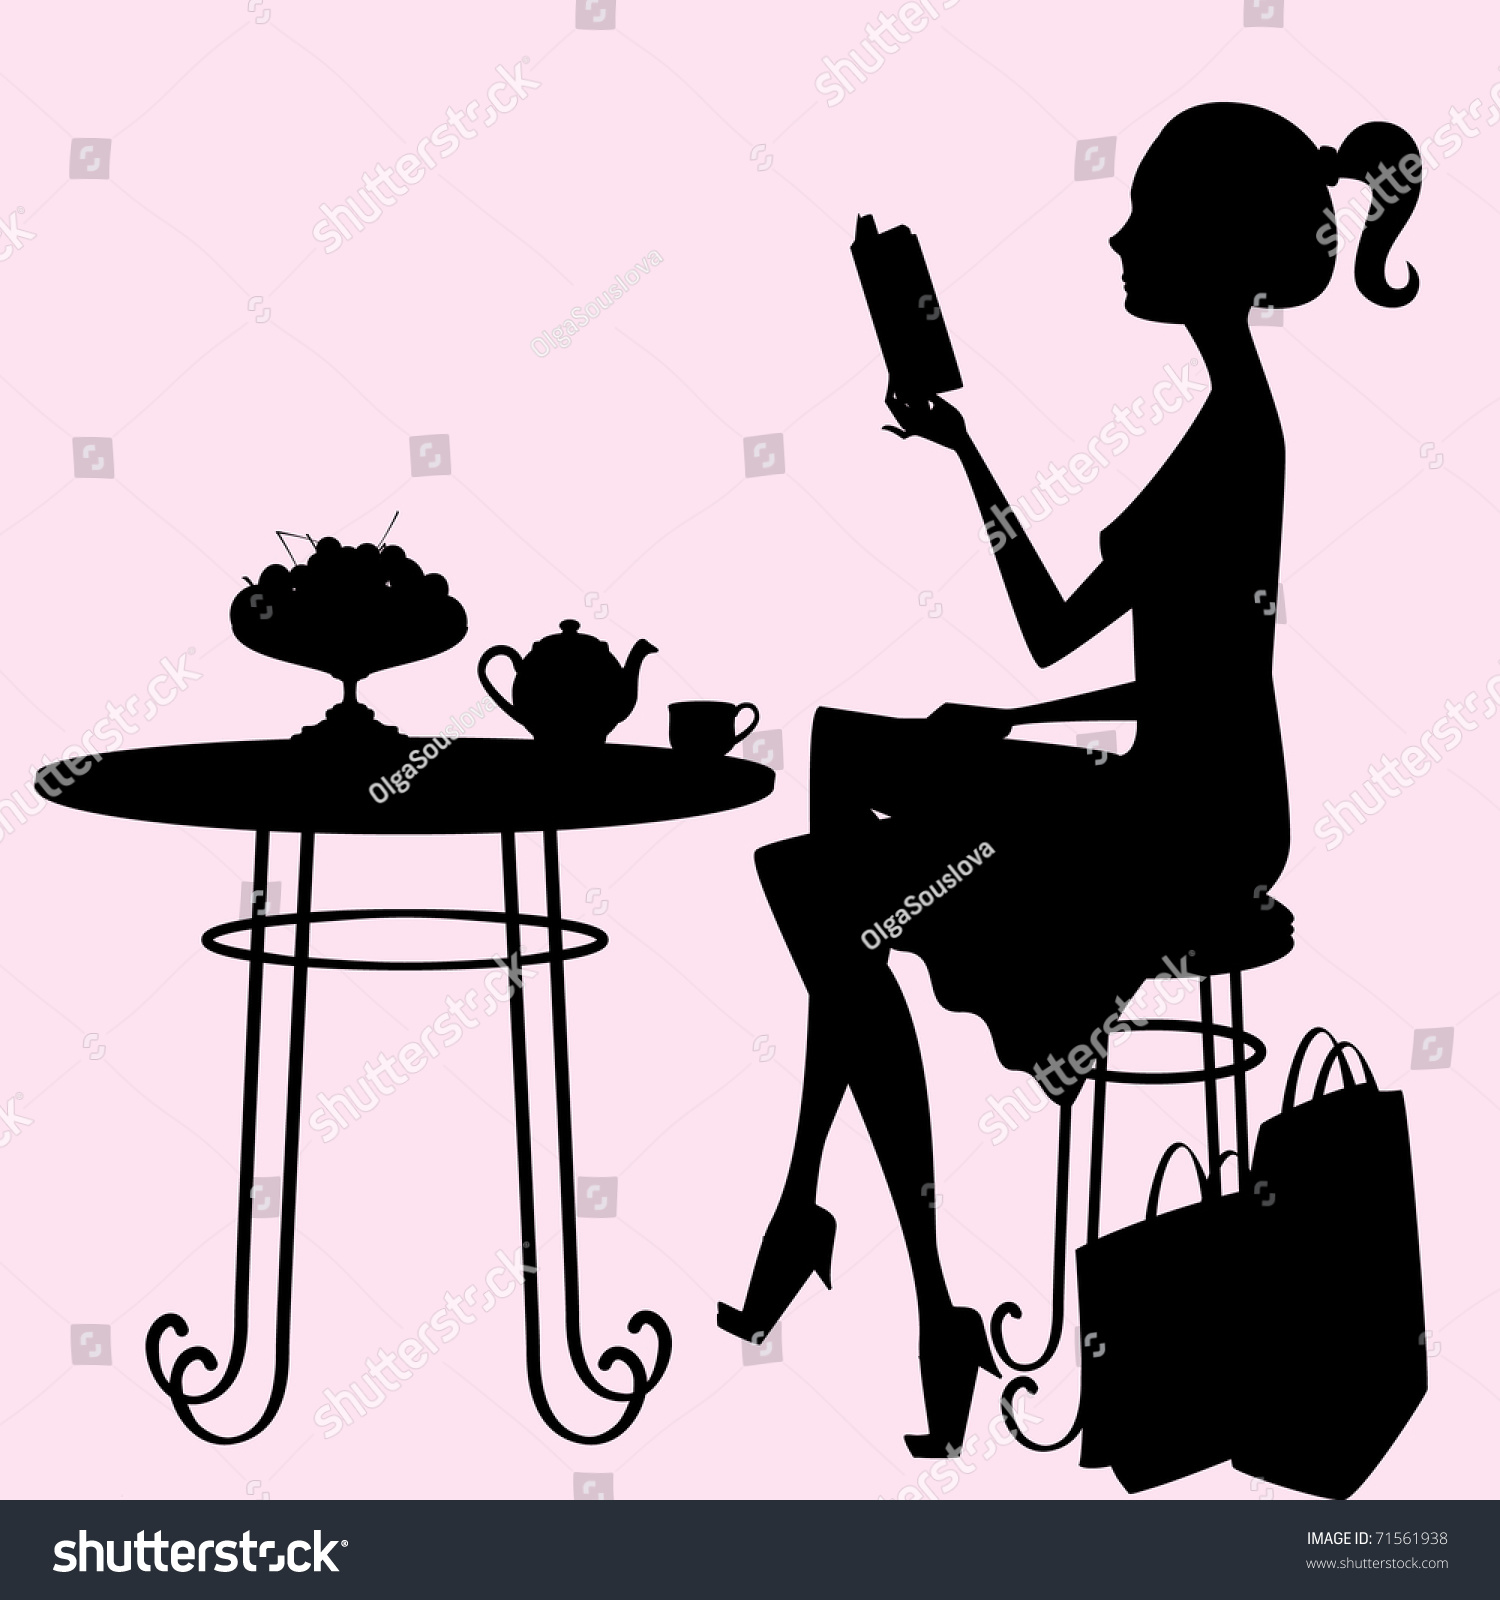 Female Silhouette Sitting Table Drinking Tea Stock Vector